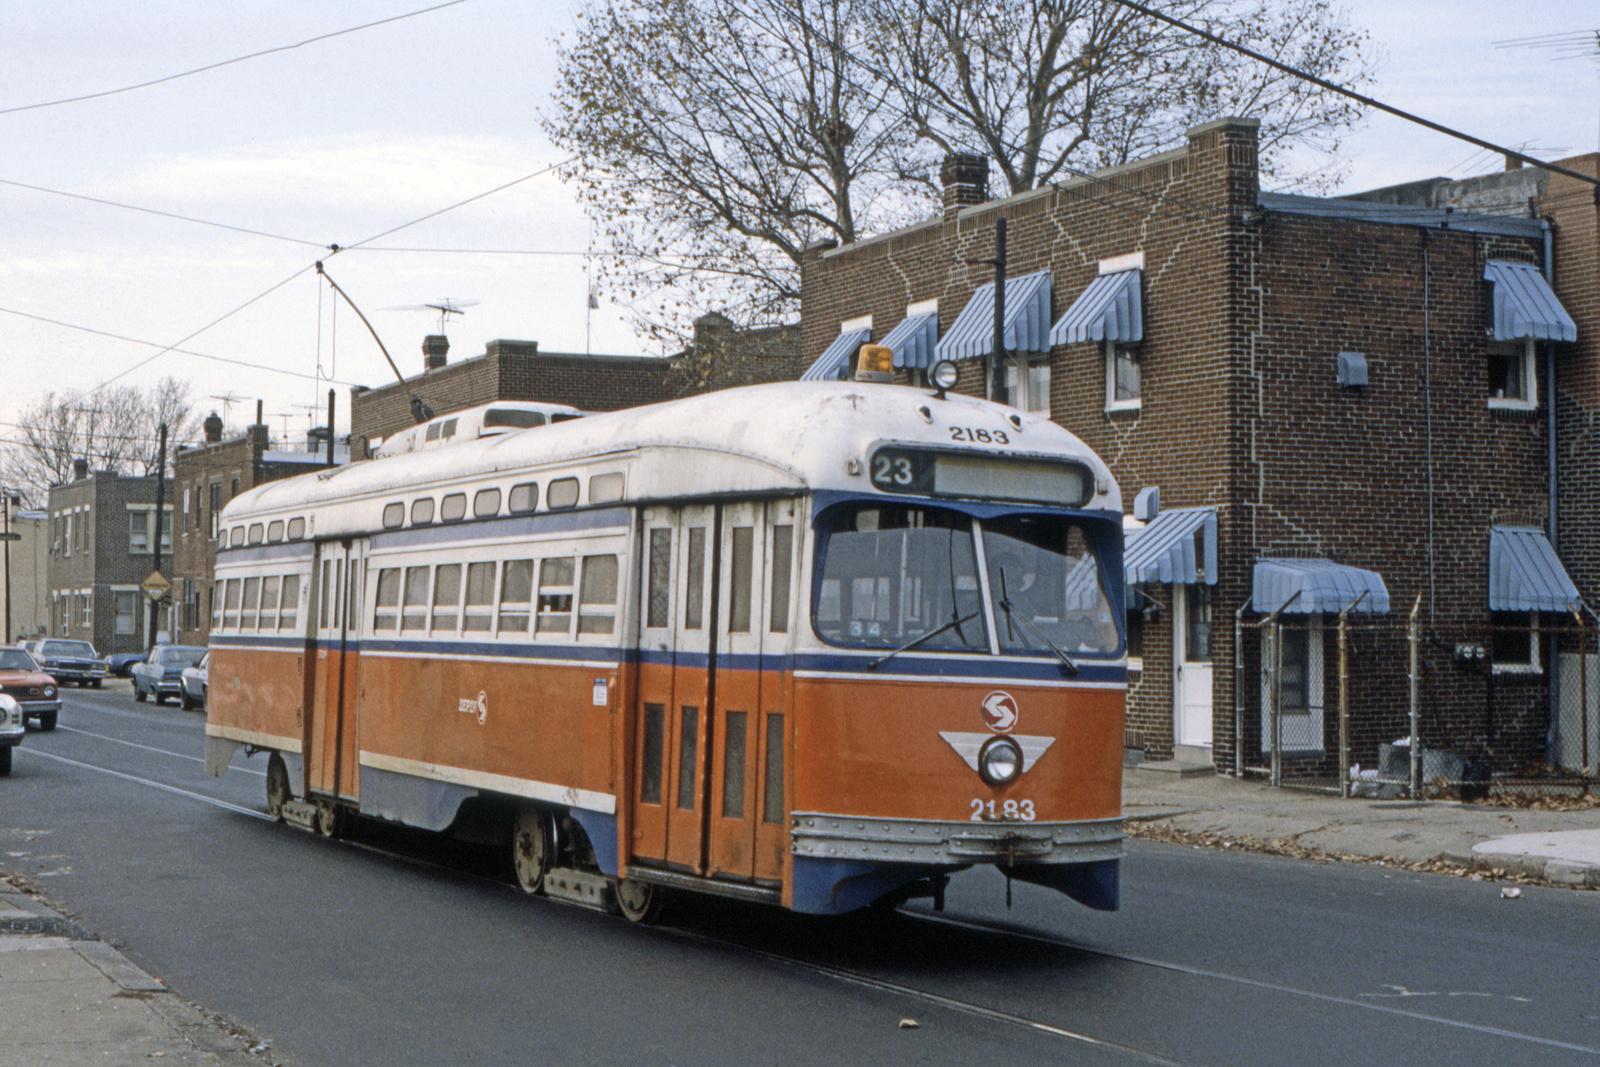 (934k, 1600x1067)<br><b>Country:</b> United States<br><b>City:</b> Philadelphia, PA<br><b>System:</b> SEPTA (or Predecessor)<br><b>Line:</b> Rt. 23-Germantown<br><b>Location:</b> 10th/Bigler<br><b>Car:</b> PTC/SEPTA Postwar All-electric PCC (St.Louis, 1948) 2183 <br><b>Collection of:</b> David Pirmann<br><b>Date:</b> 5/1983<br><b>Viewed (this week/total):</b> 2 / 57